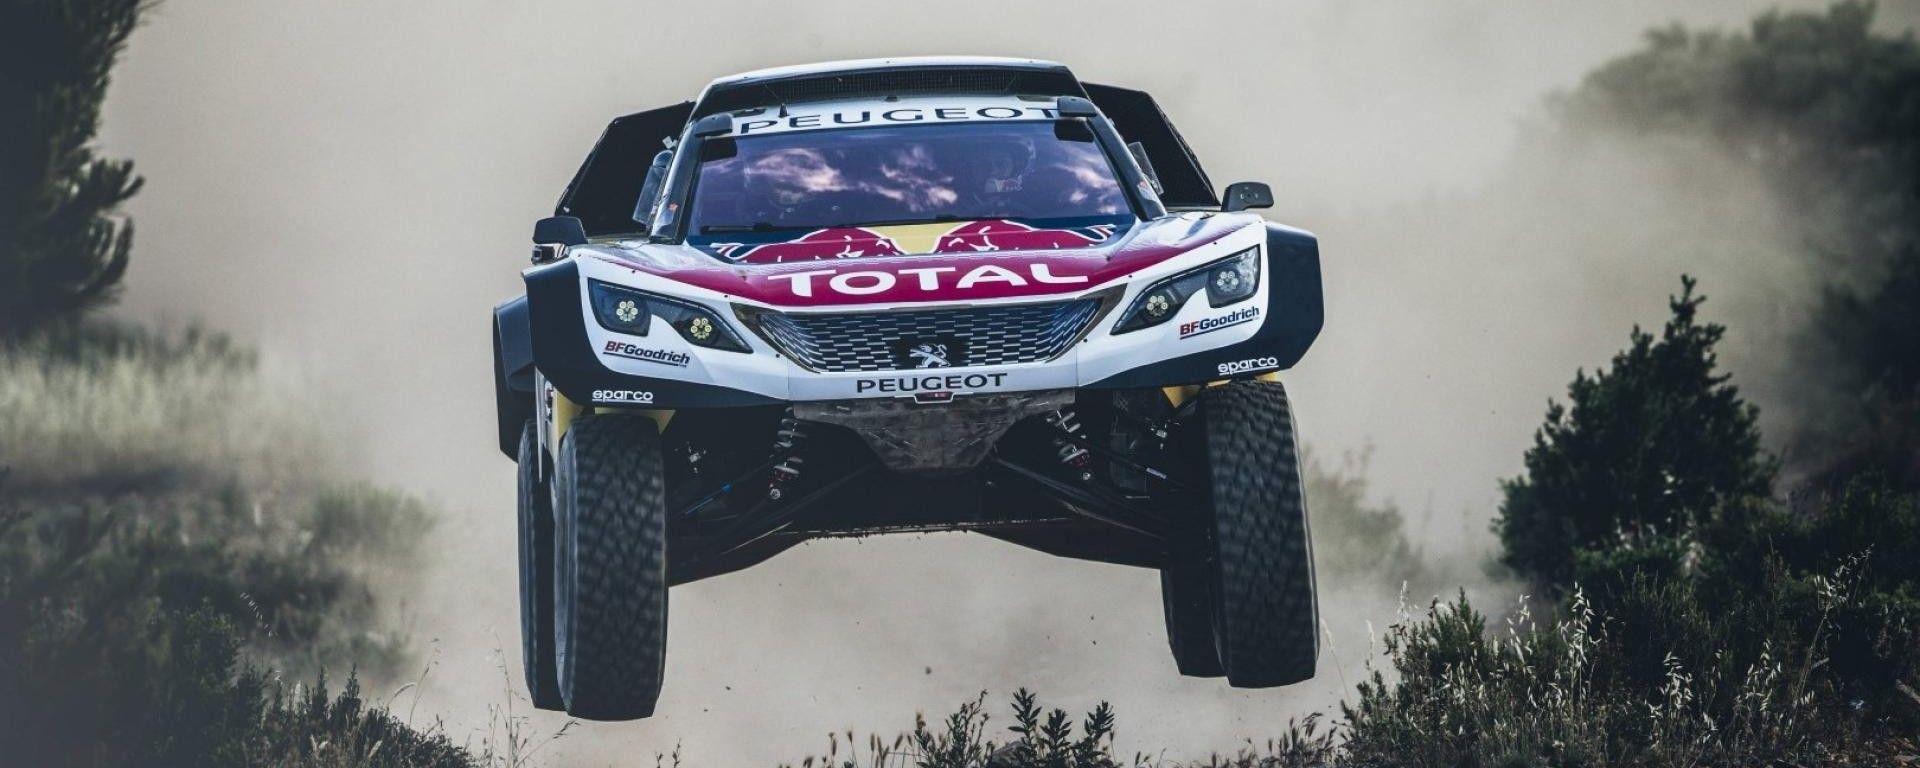 Peugeot 3008 DKR Maxi al Silk Way Rally 2017